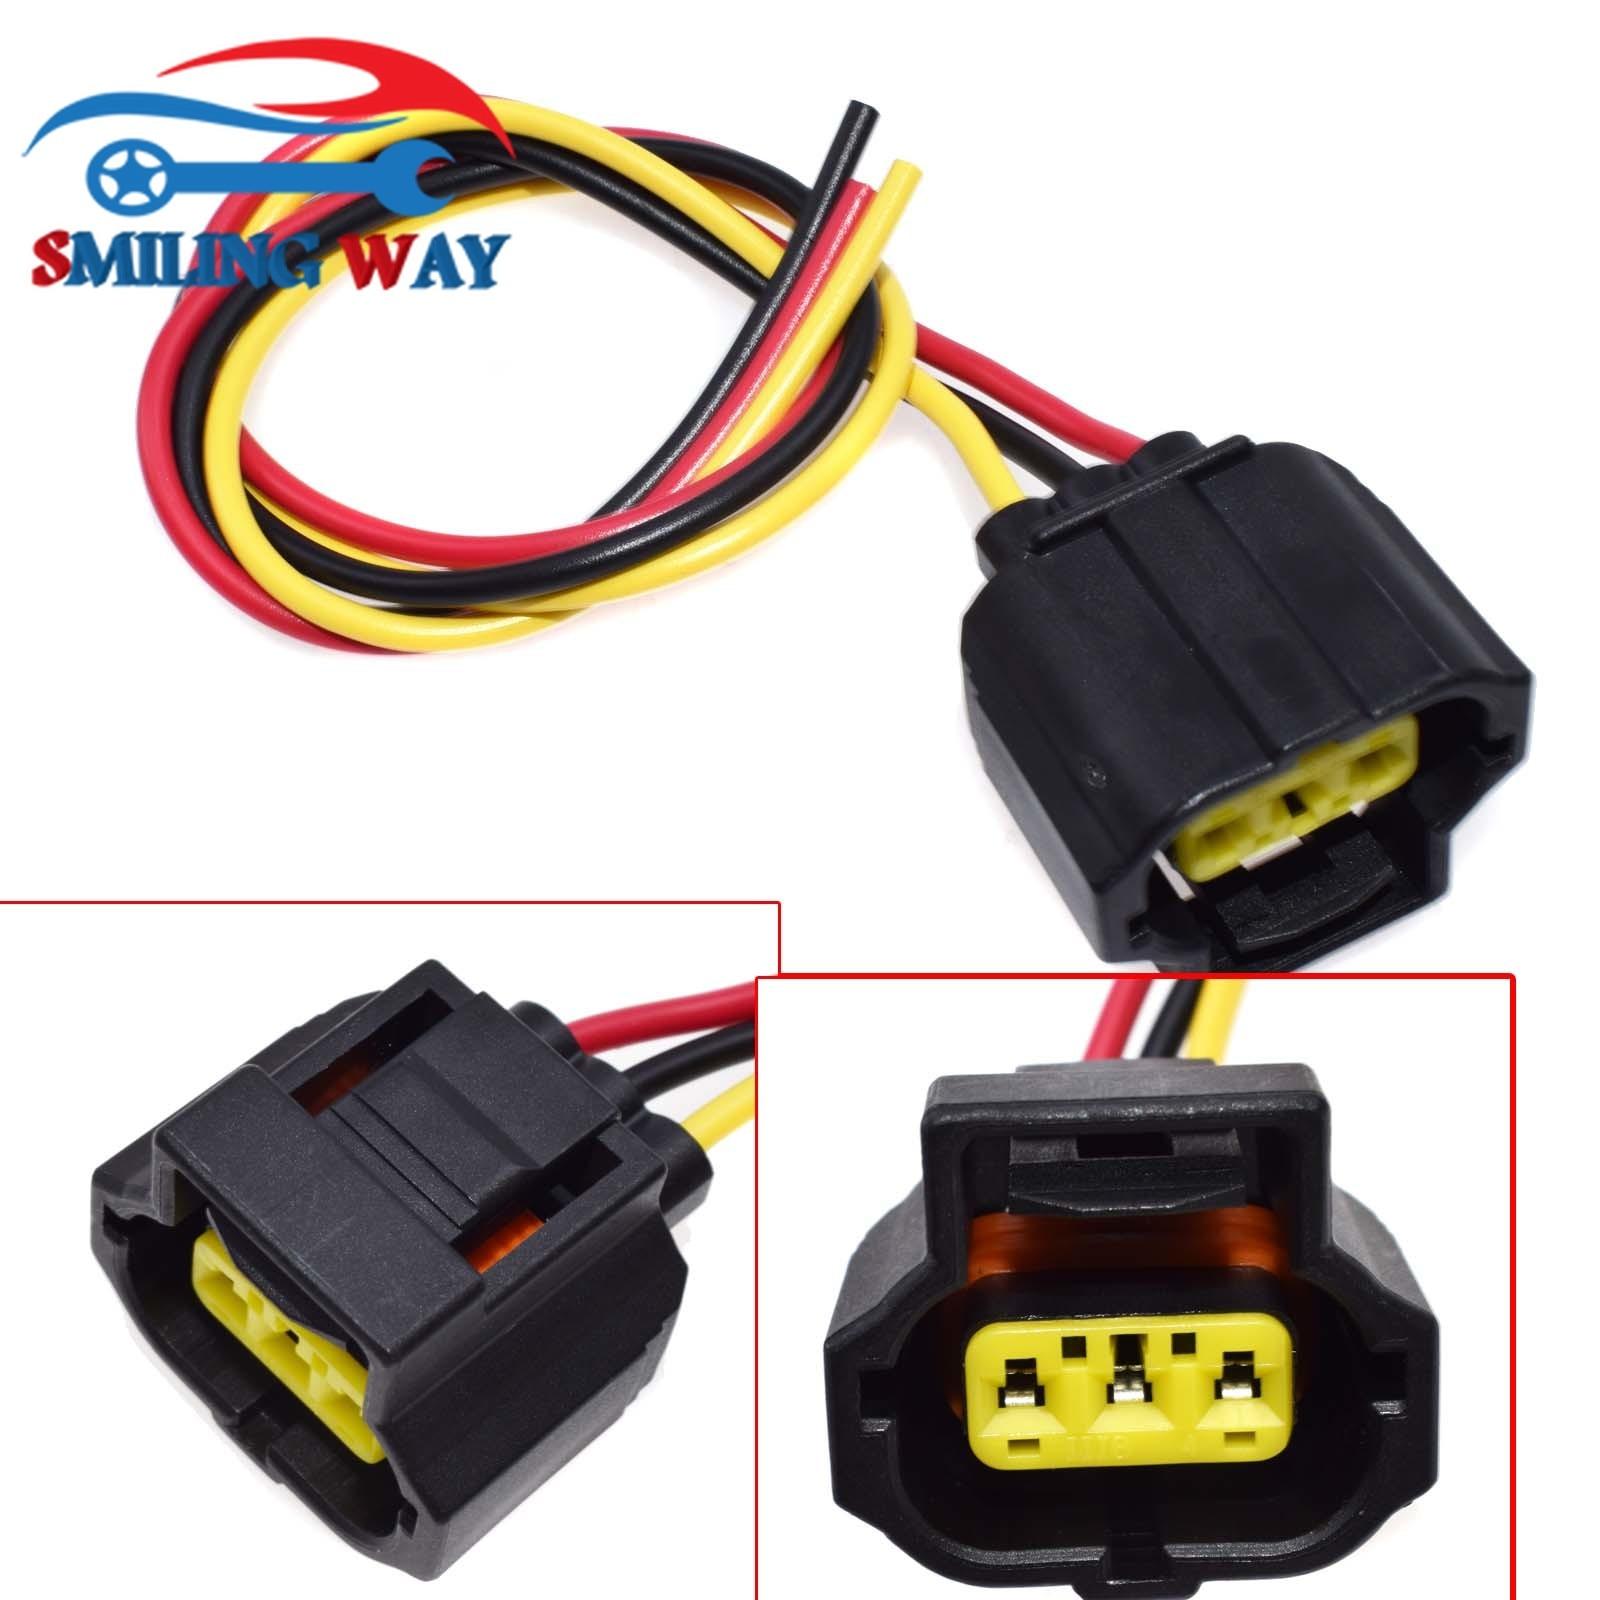 Strange Smiling Way 3 Pins Sensor Alternator Connector Wire Harness Wiring Wiring Digital Resources Bletukbiperorg